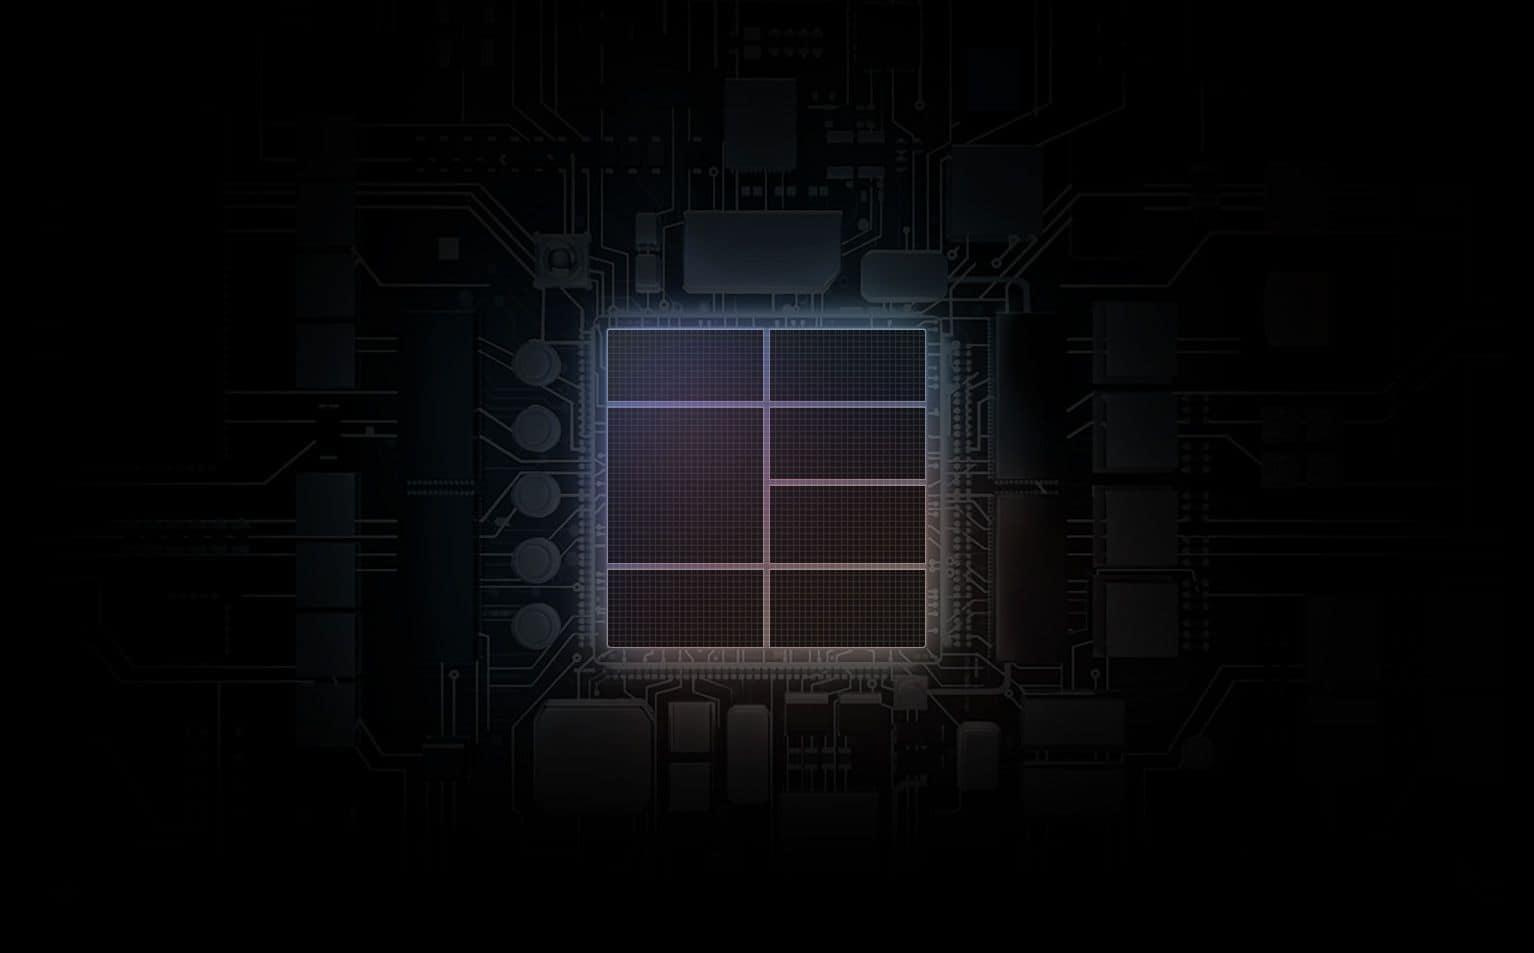 Samsung Galaxy S10 128 Go Double SIM Noir prisme image 7 | Rakuten